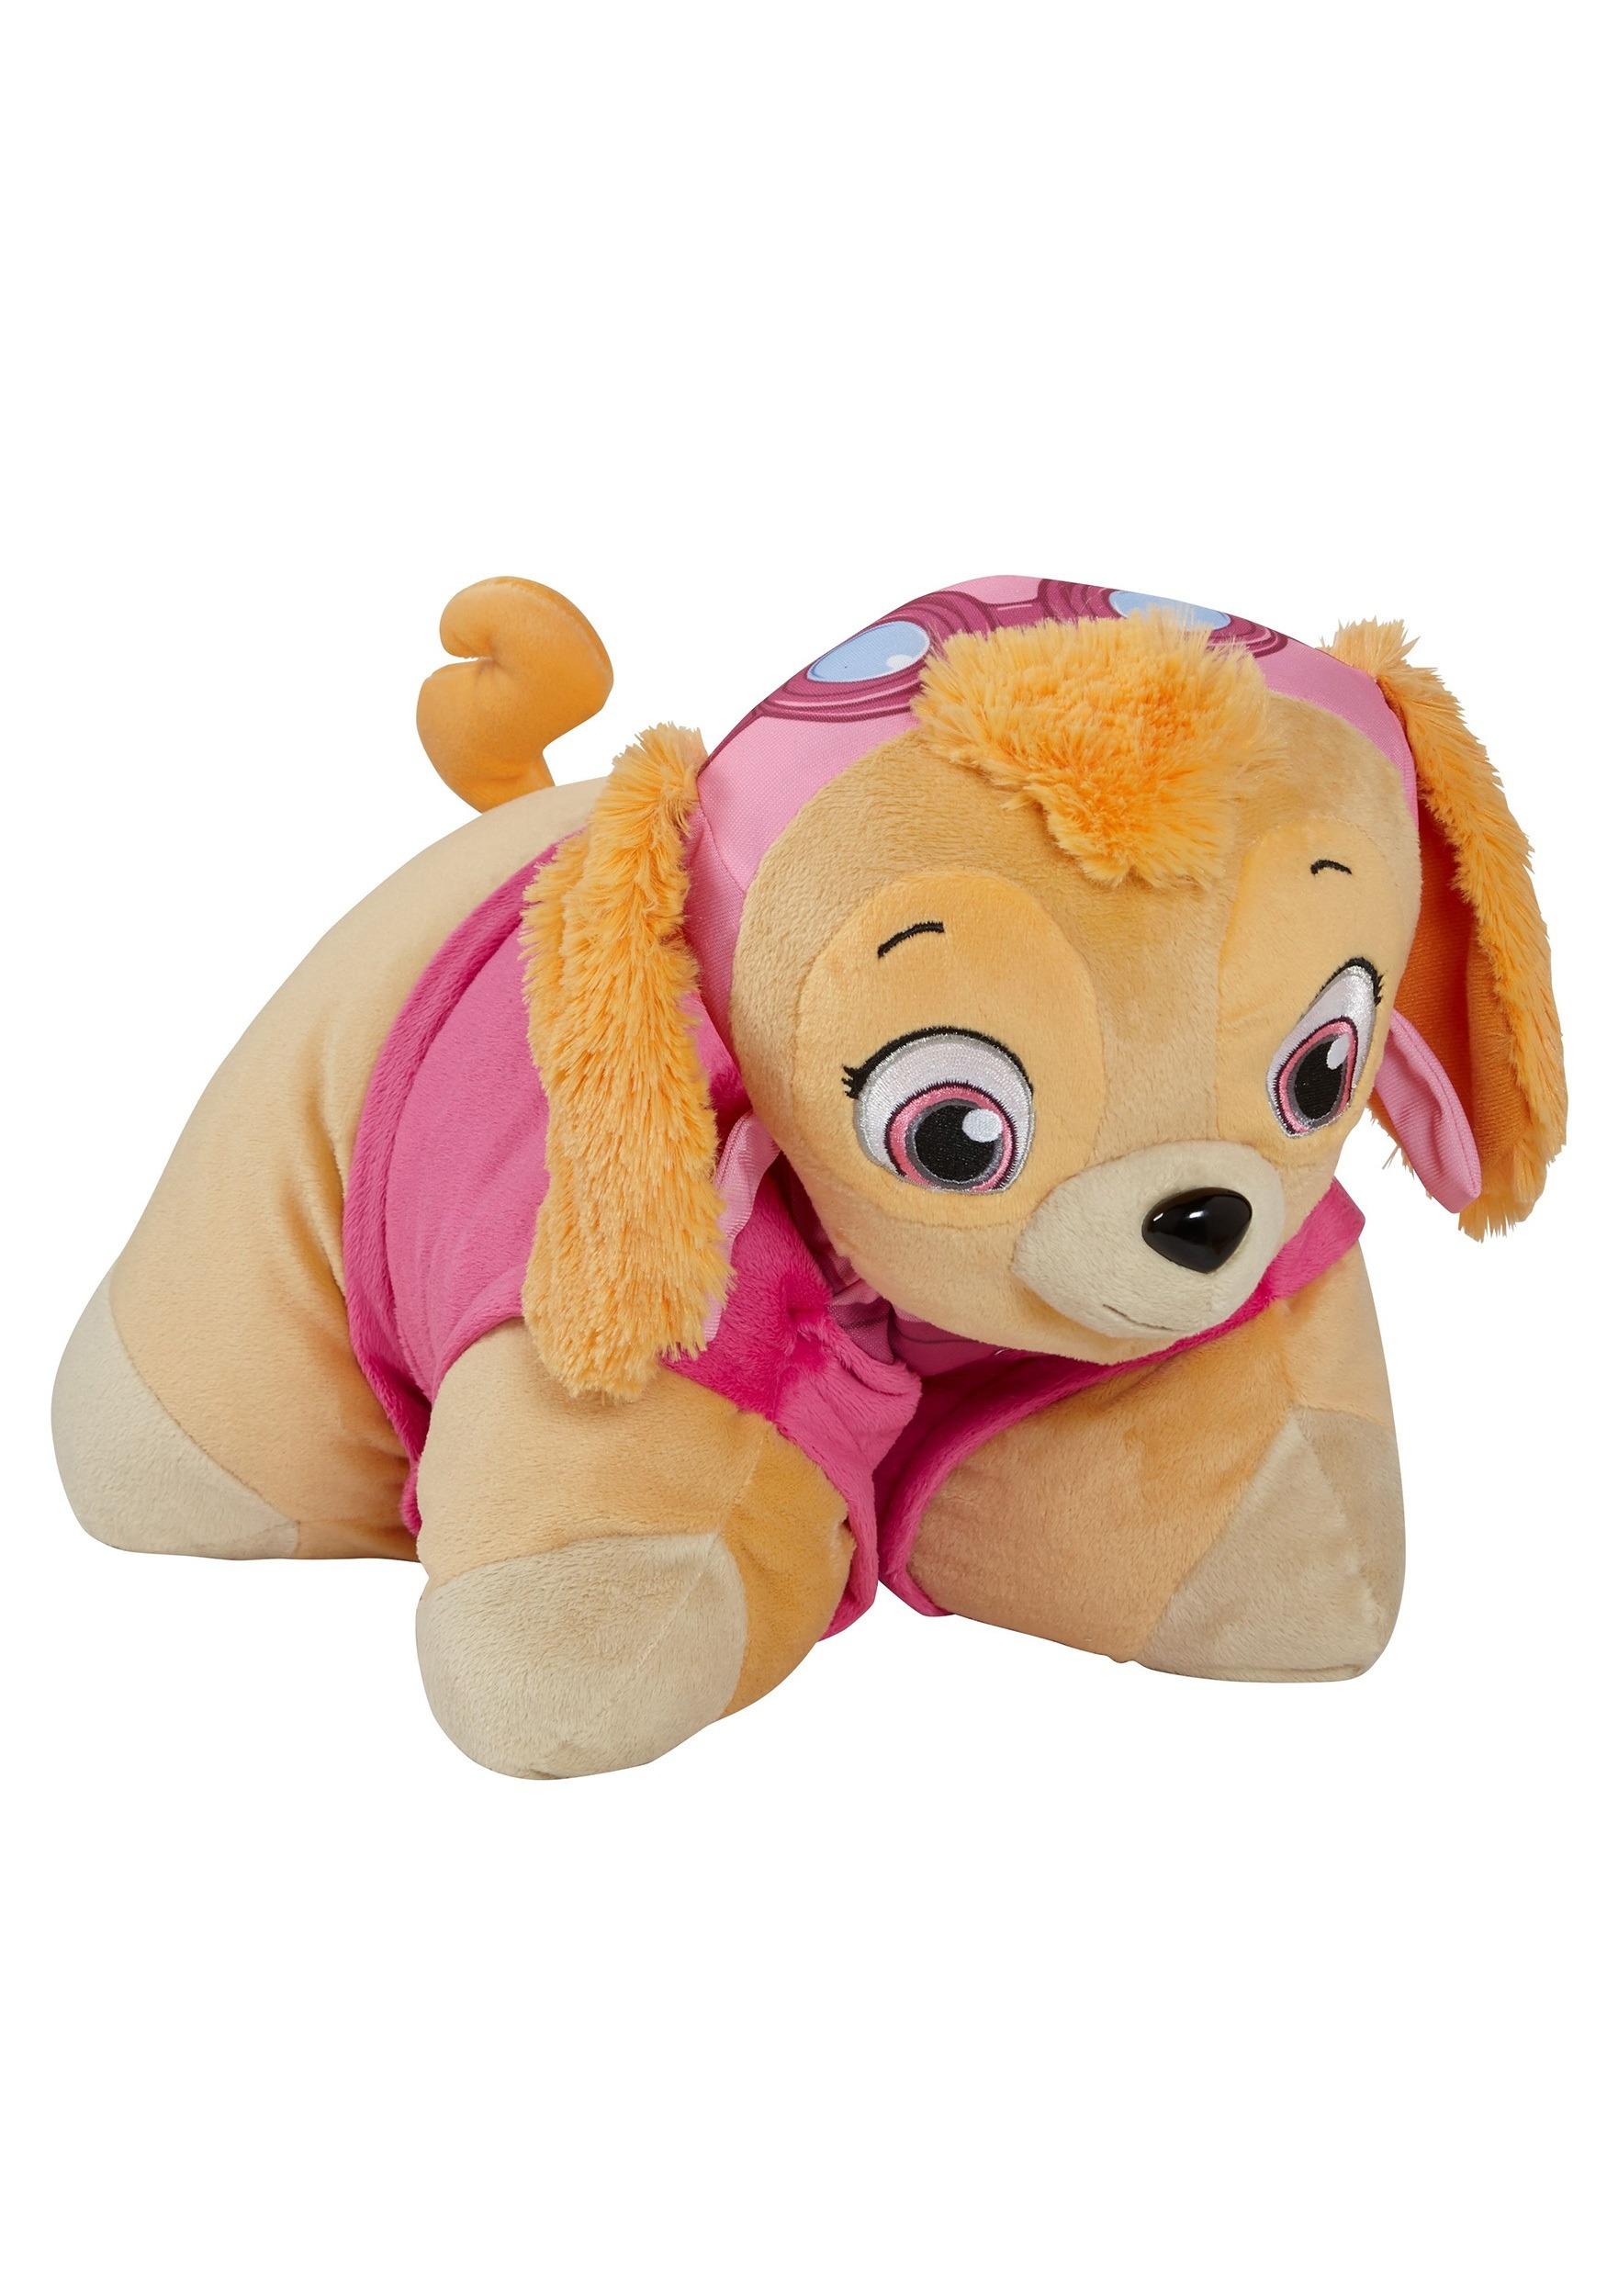 Paw Patrol Skye Pillow Pet 16